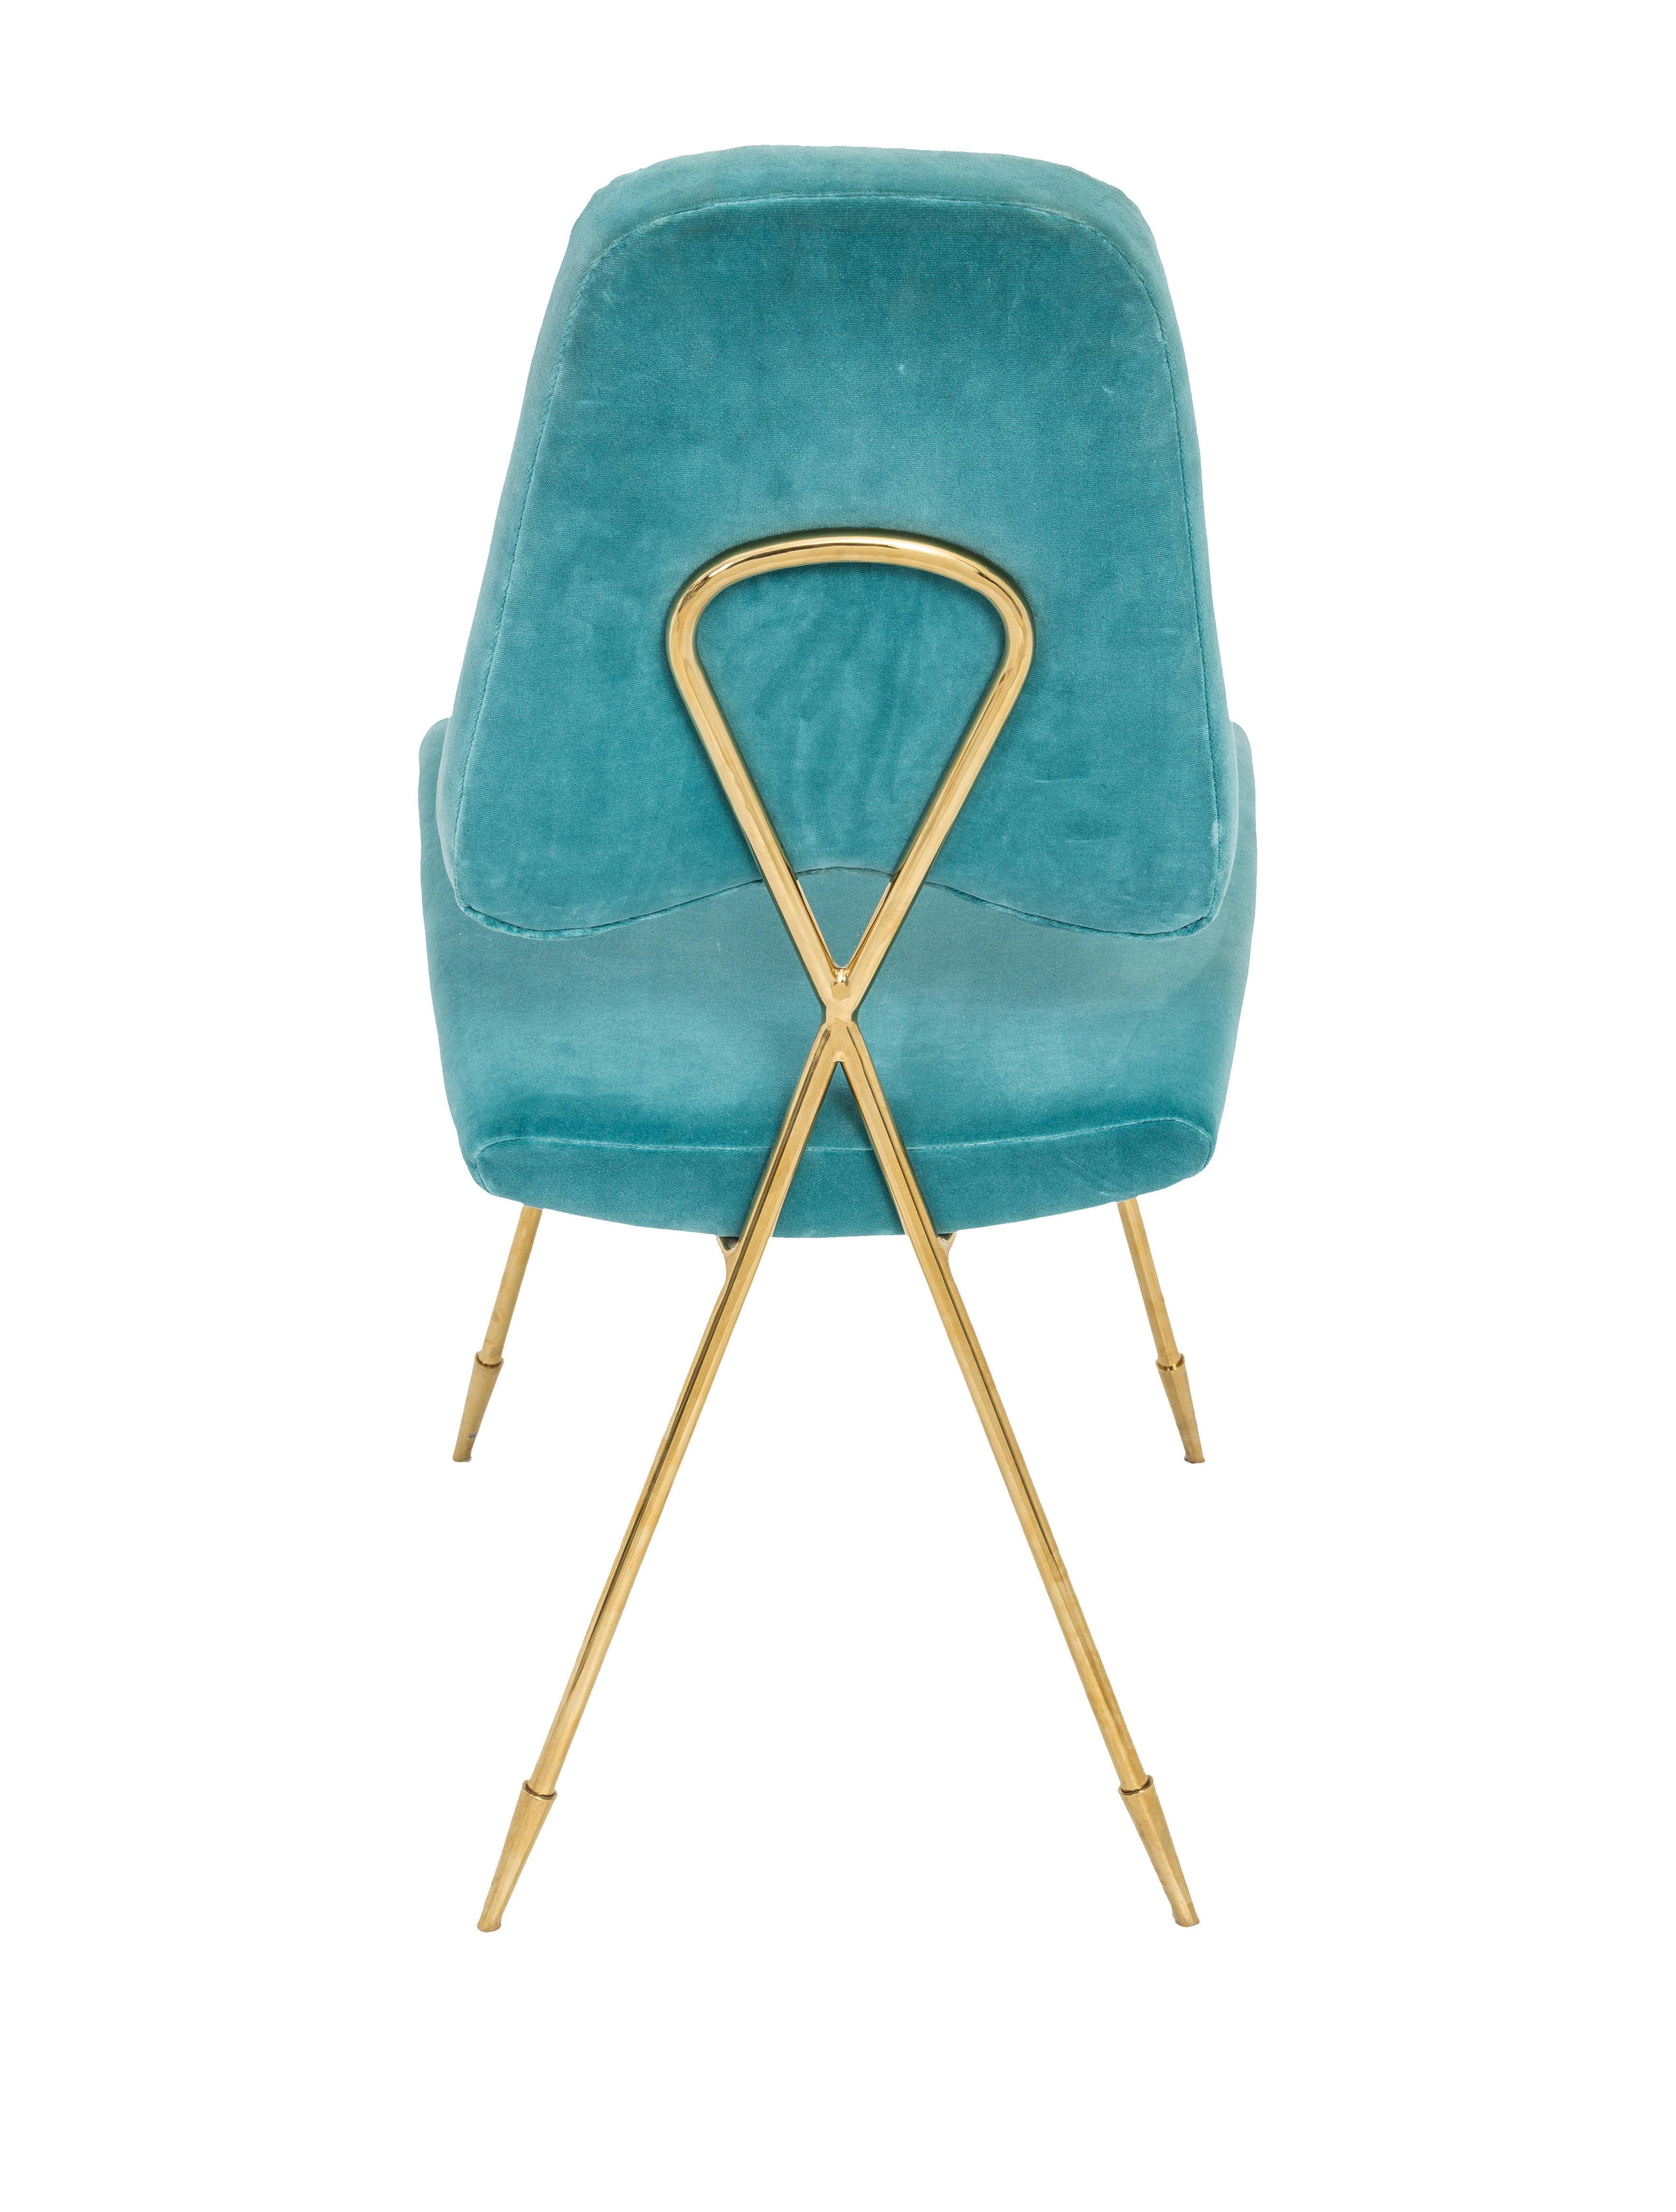 Jonathan Adler Maxime Lounge Chair Furniture JTADL